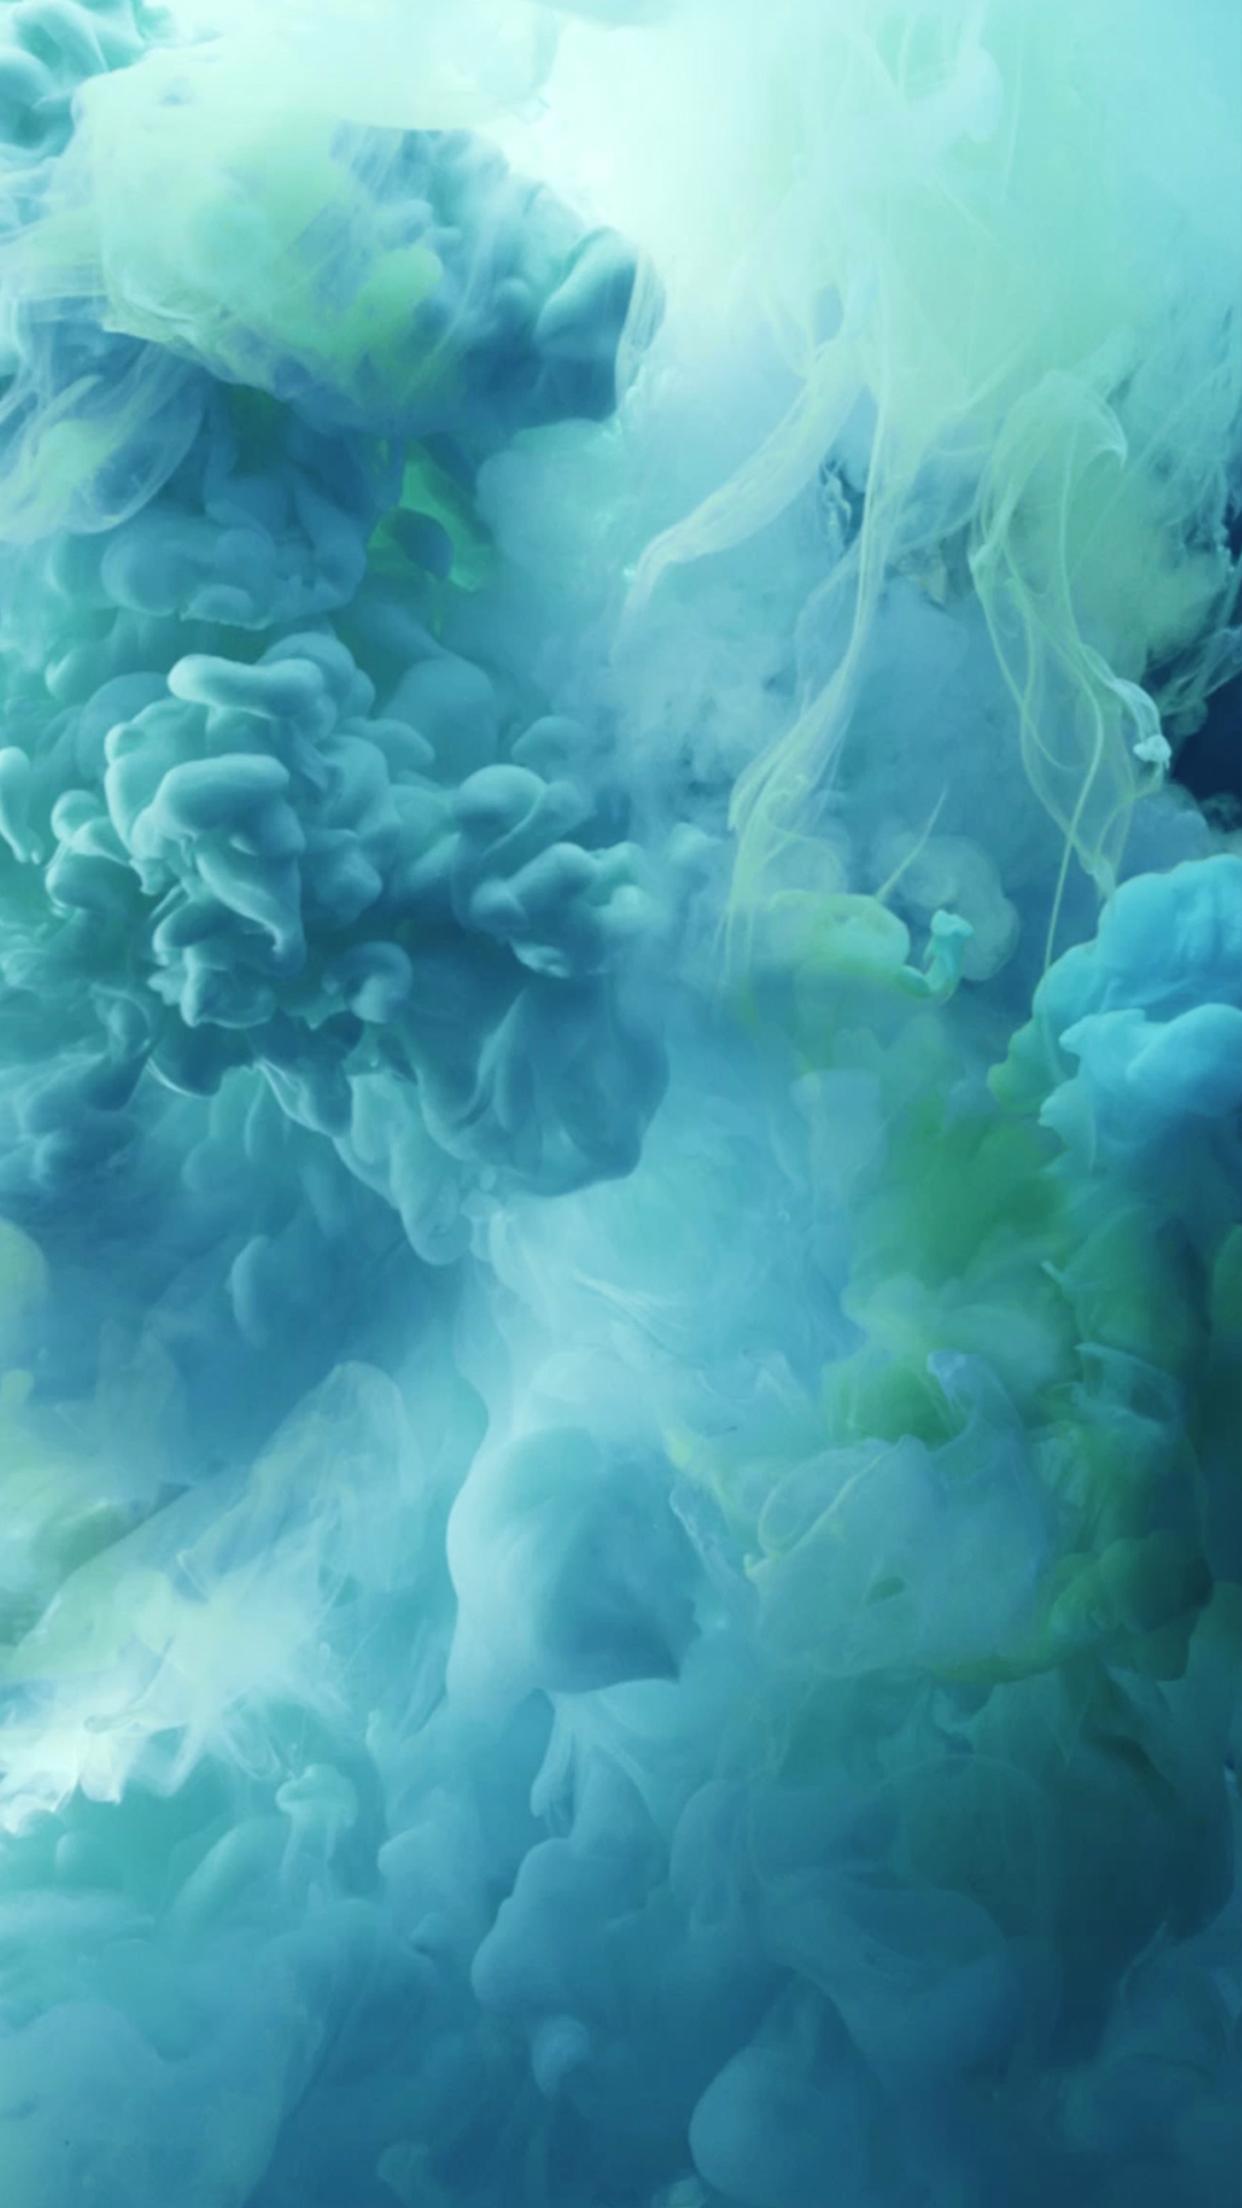 iPhone-6s-Blue-Ink-Wallpaper